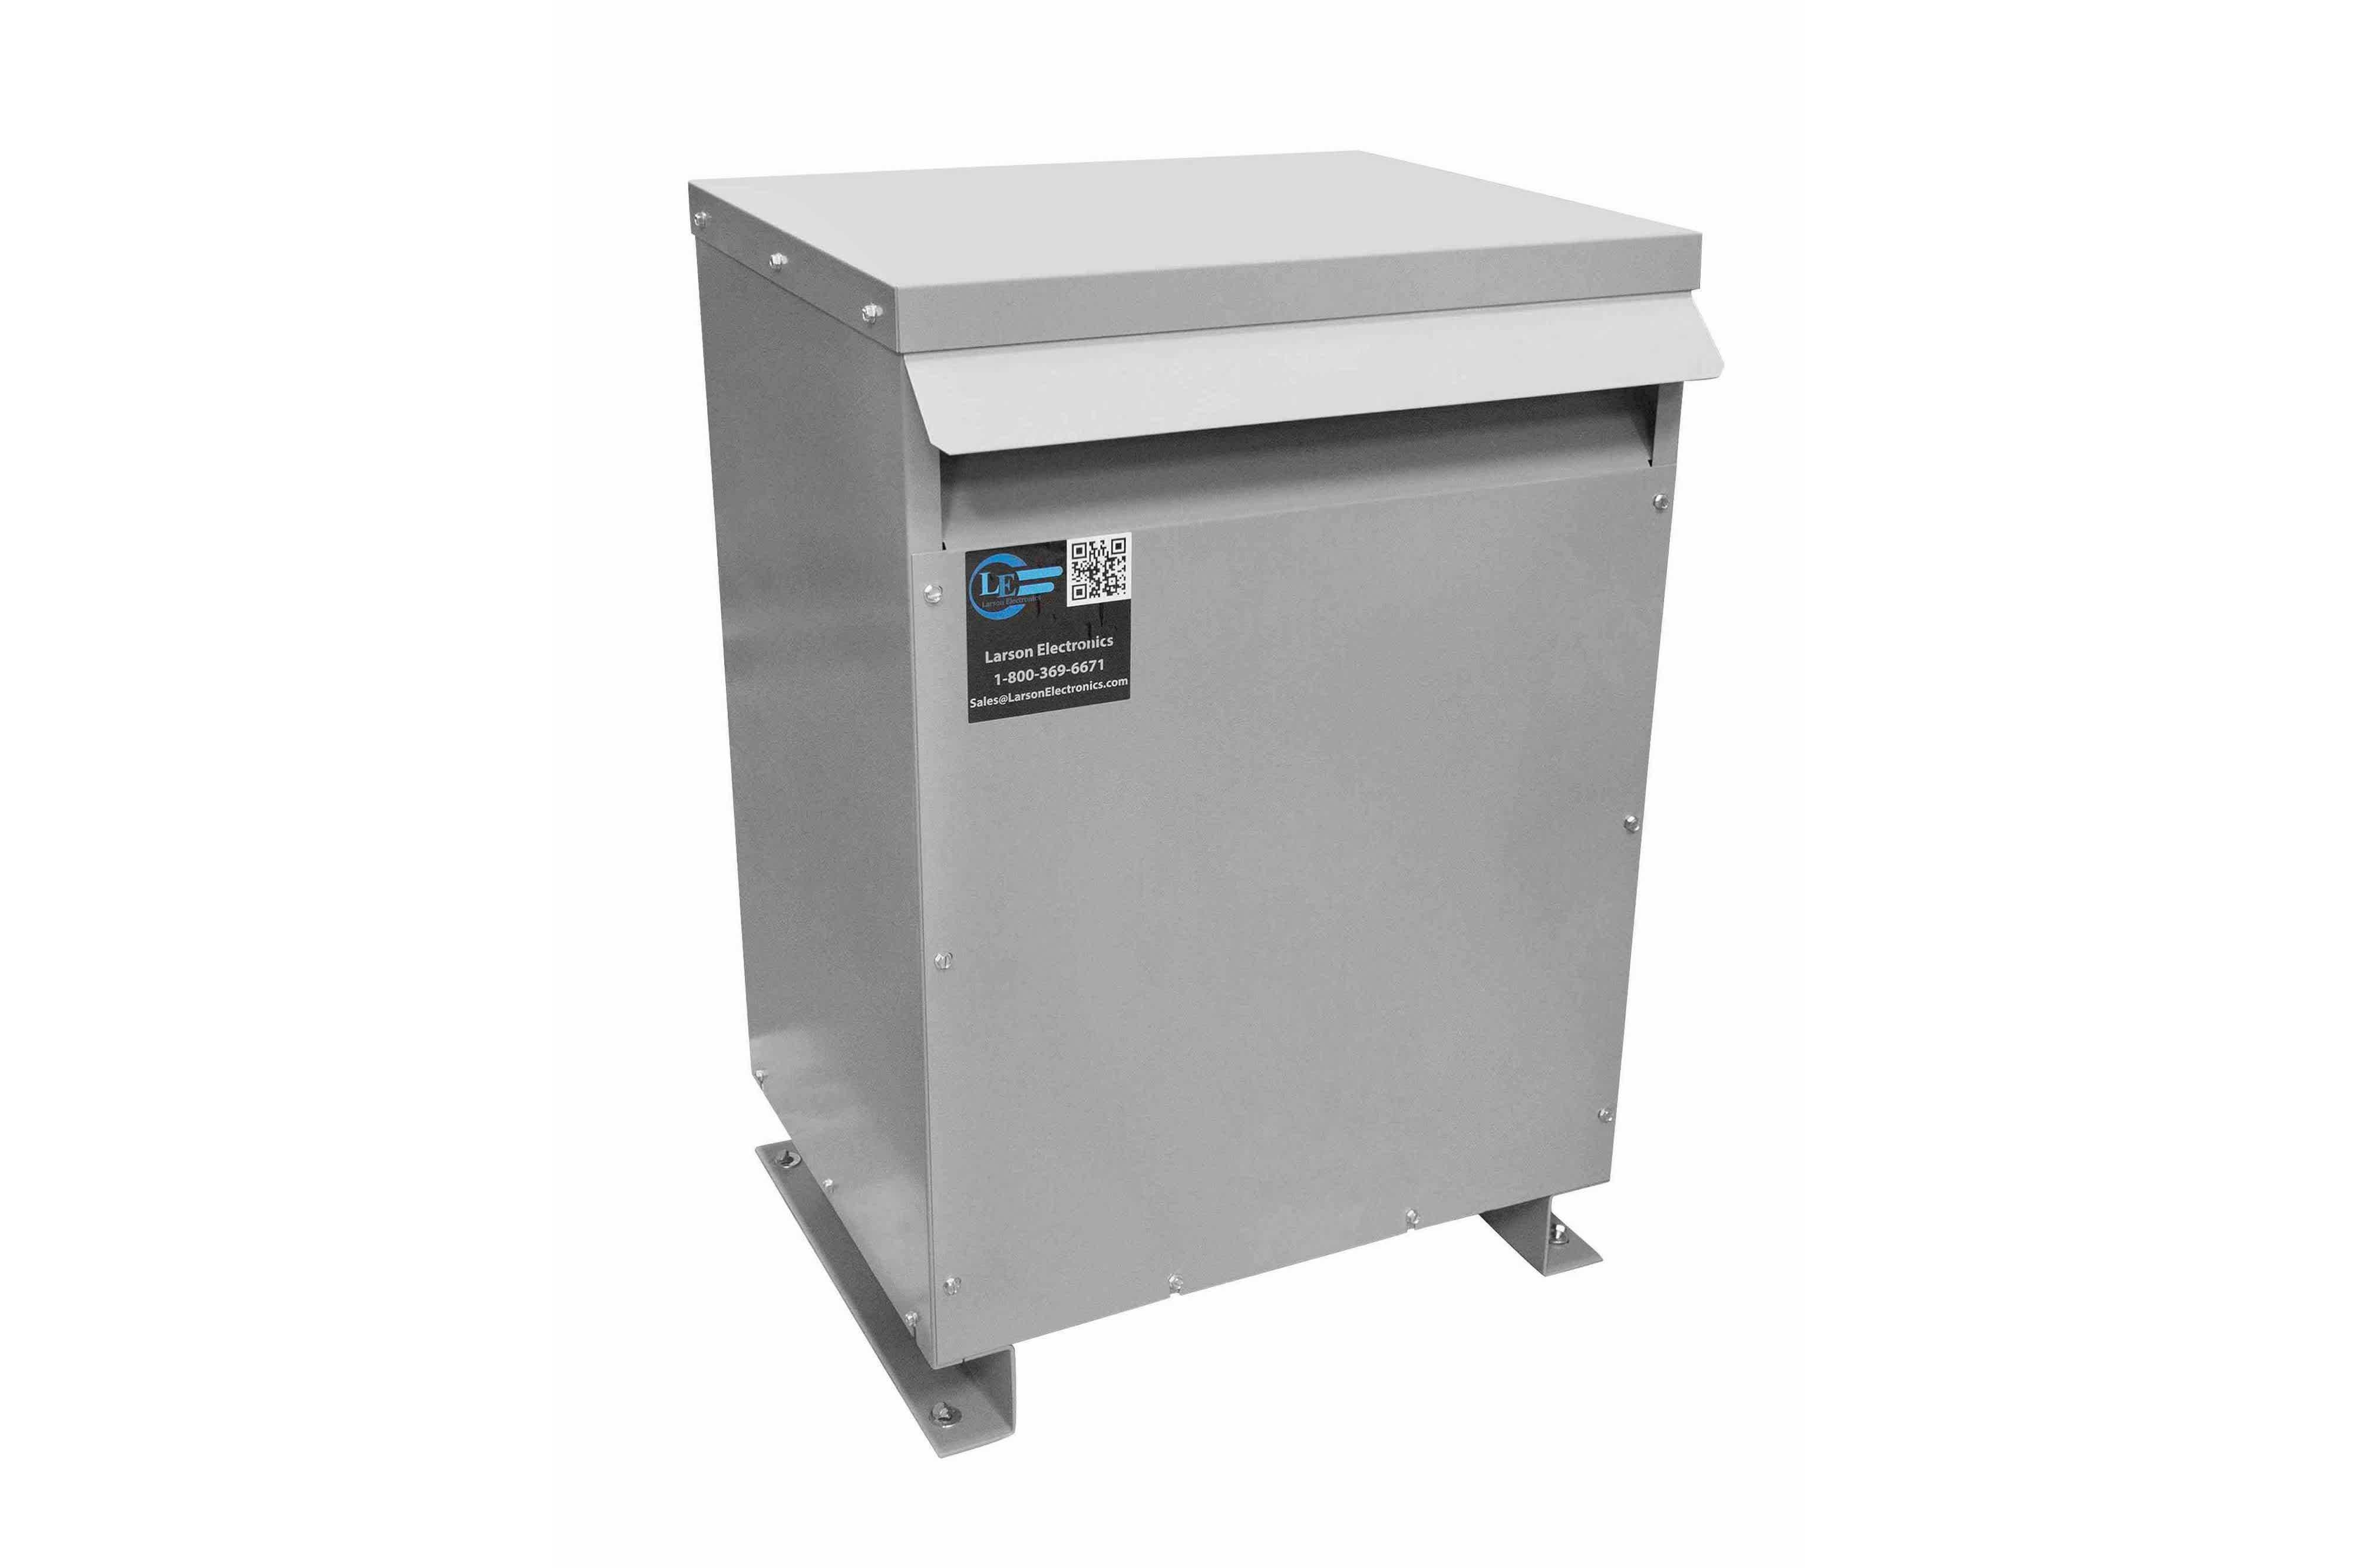 300 kVA 3PH Isolation Transformer, 575V Wye Primary, 400Y/231 Wye-N Secondary, N3R, Ventilated, 60 Hz